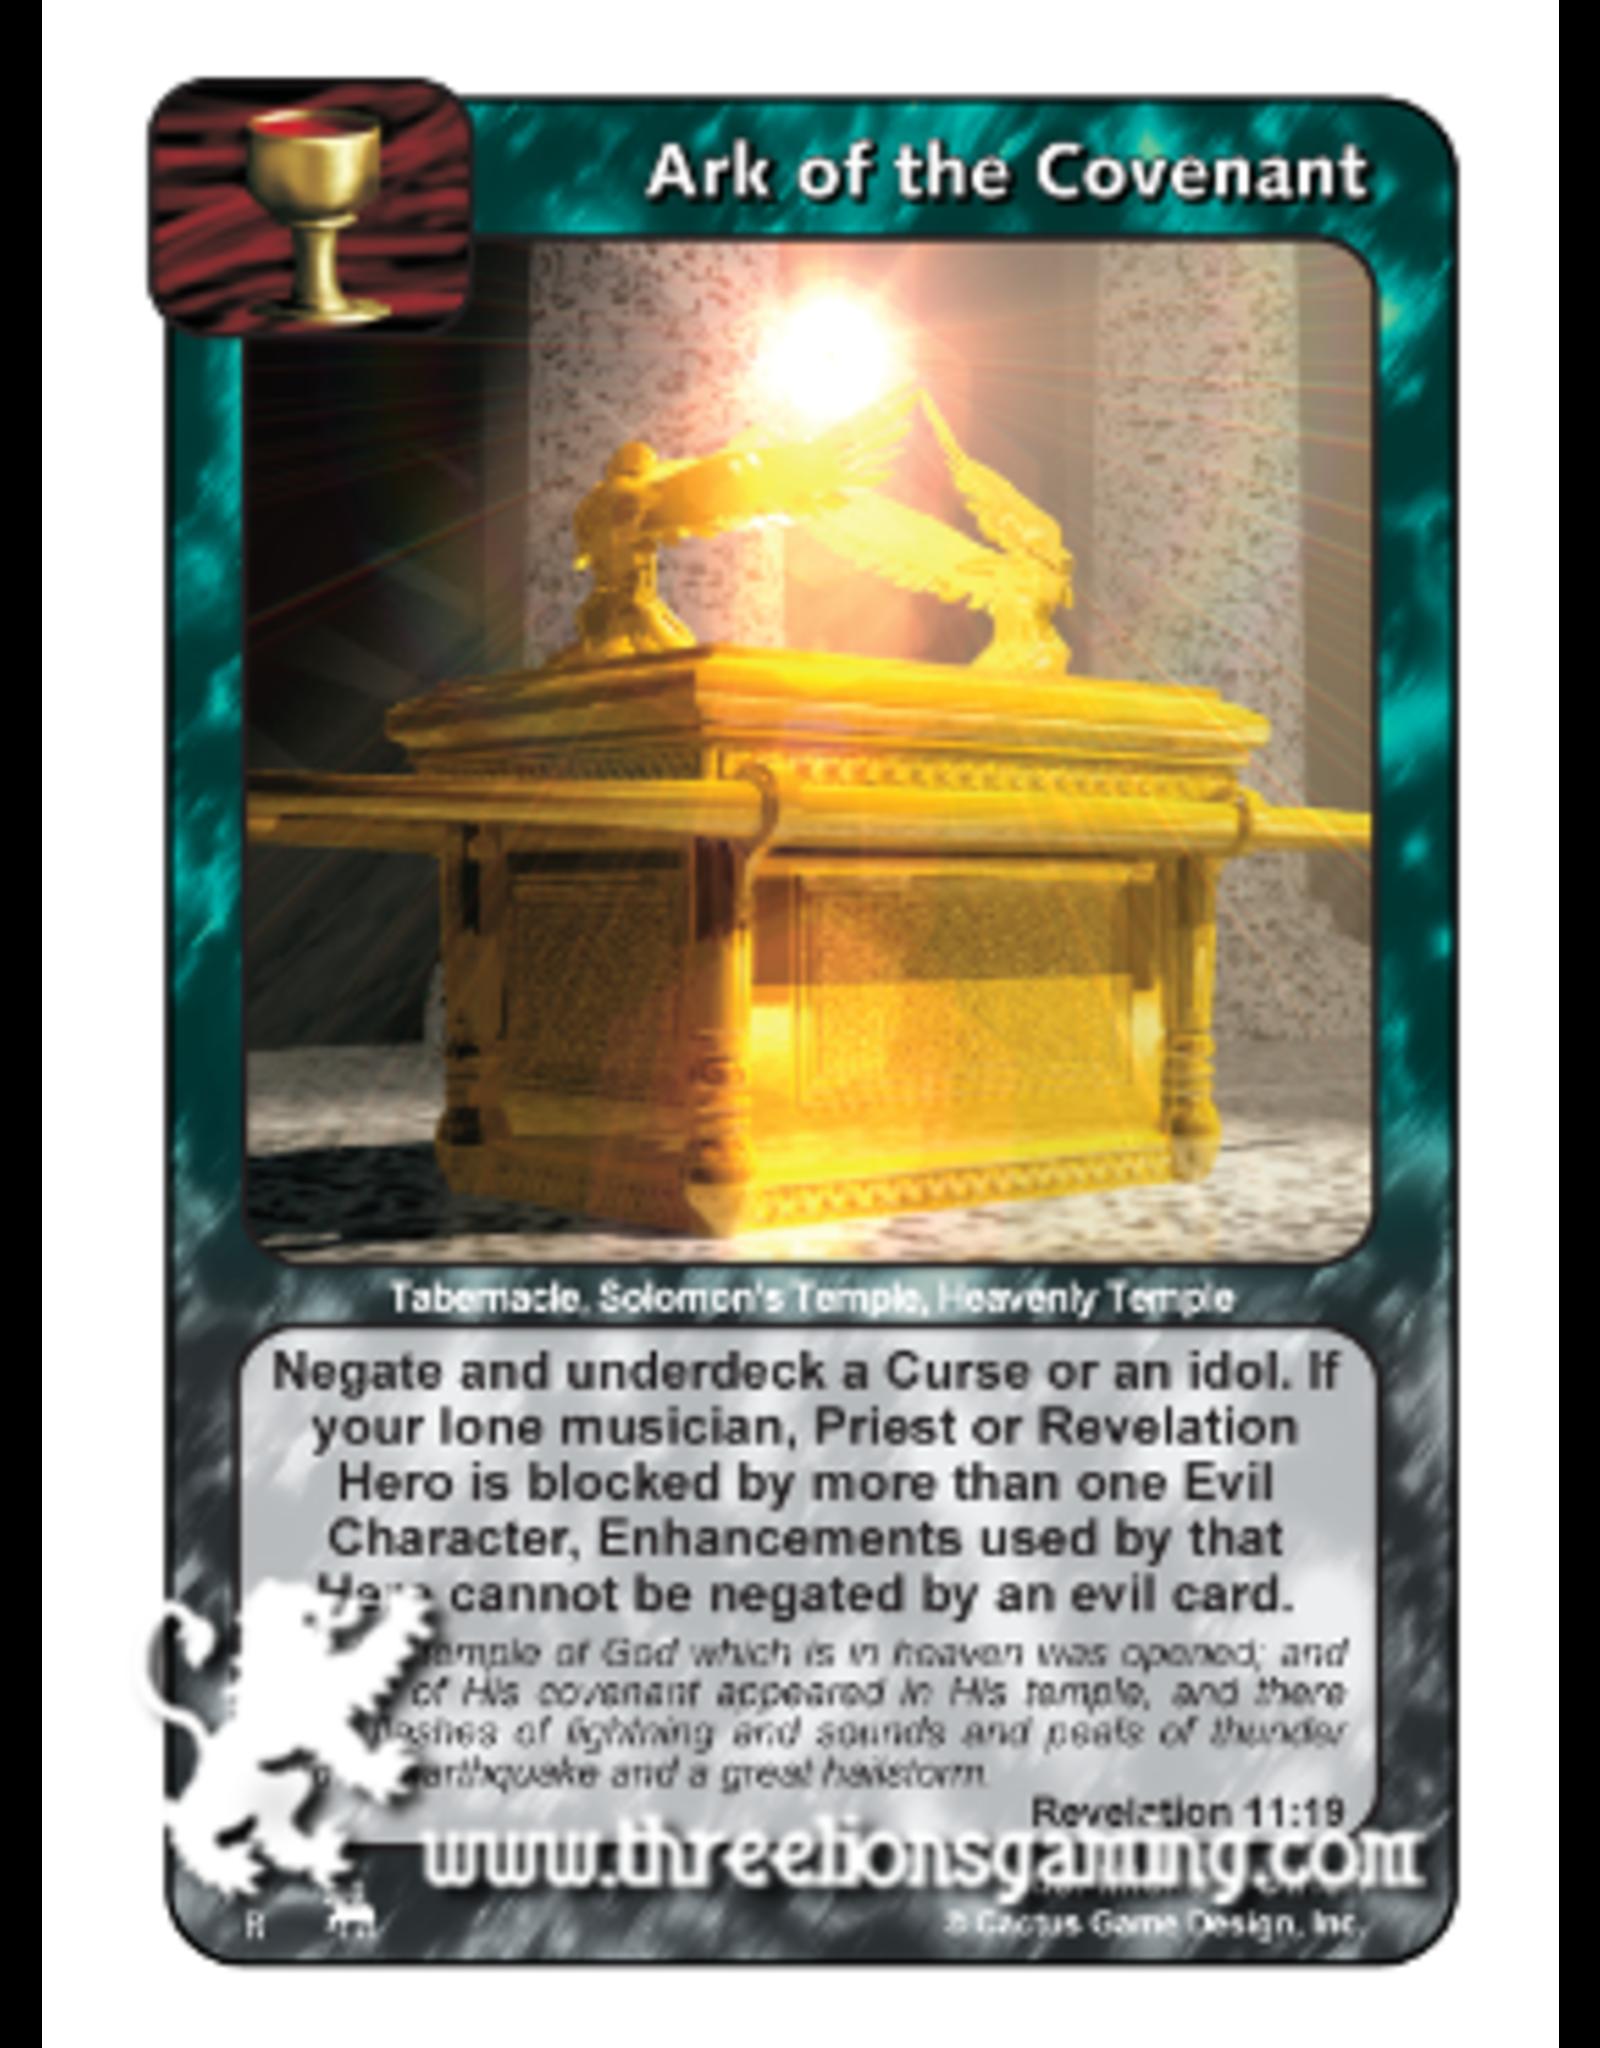 RoJ: Ark of the Covenant